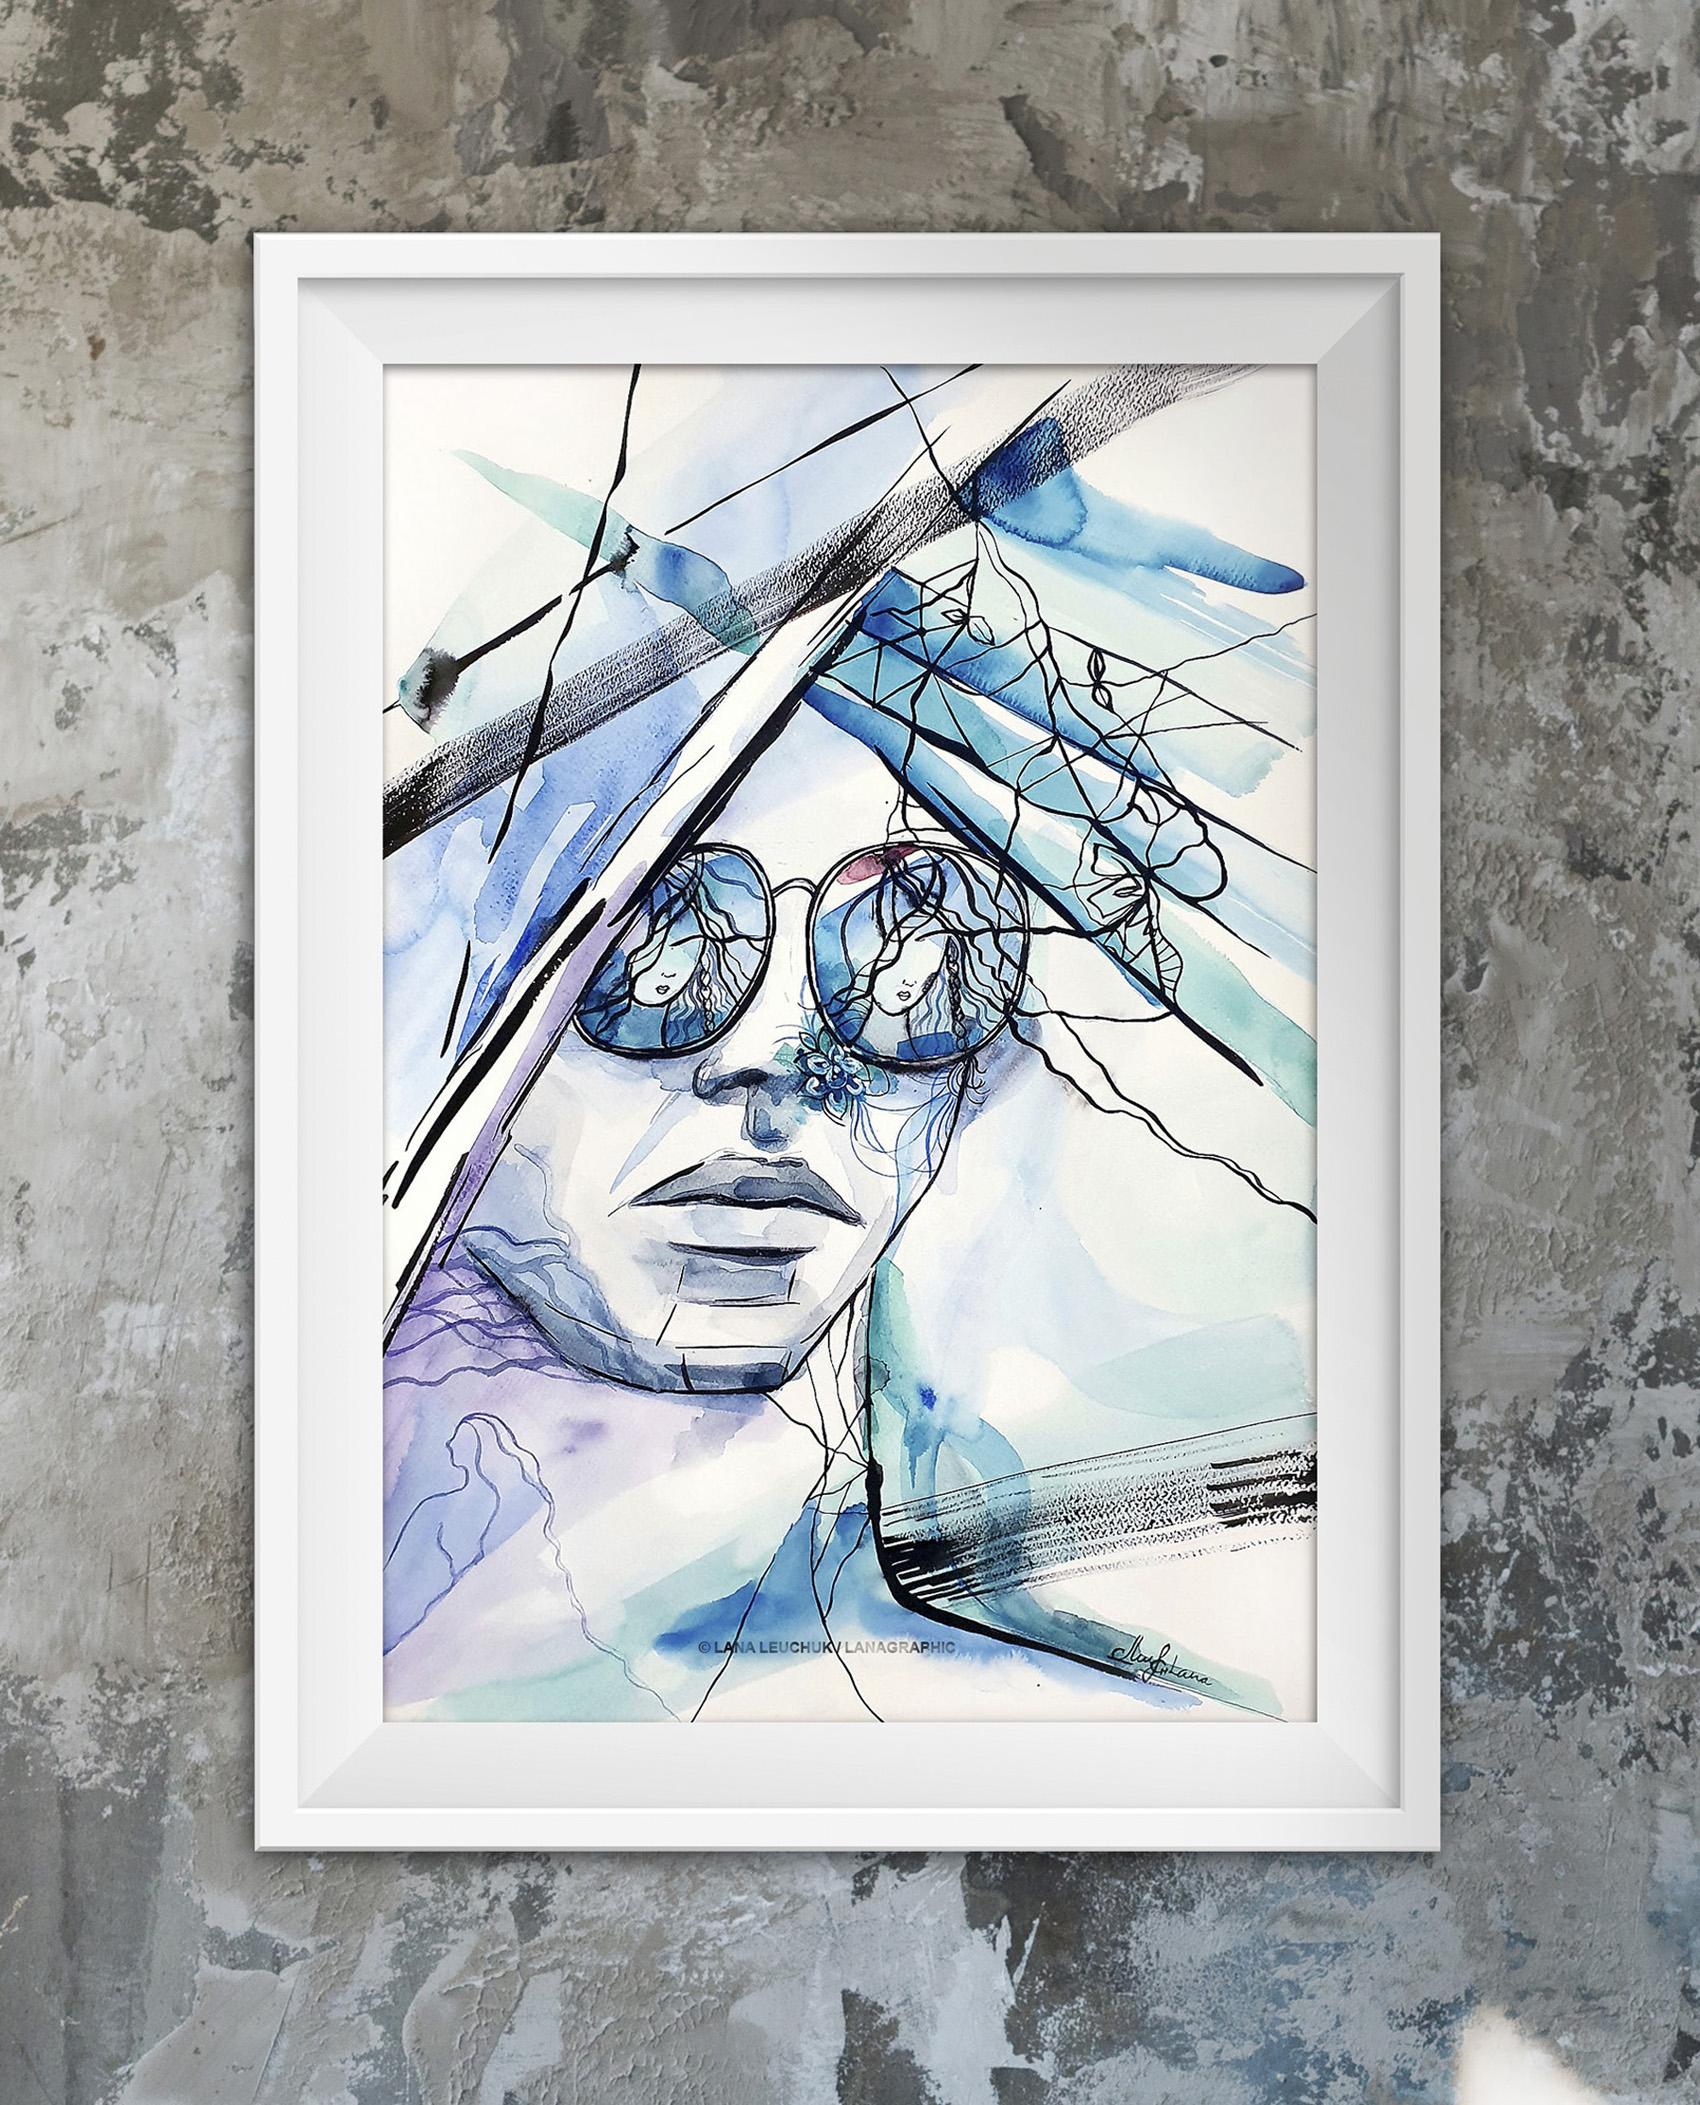 We just need a little-1-artwork by Svetlana Leuchuk-framed